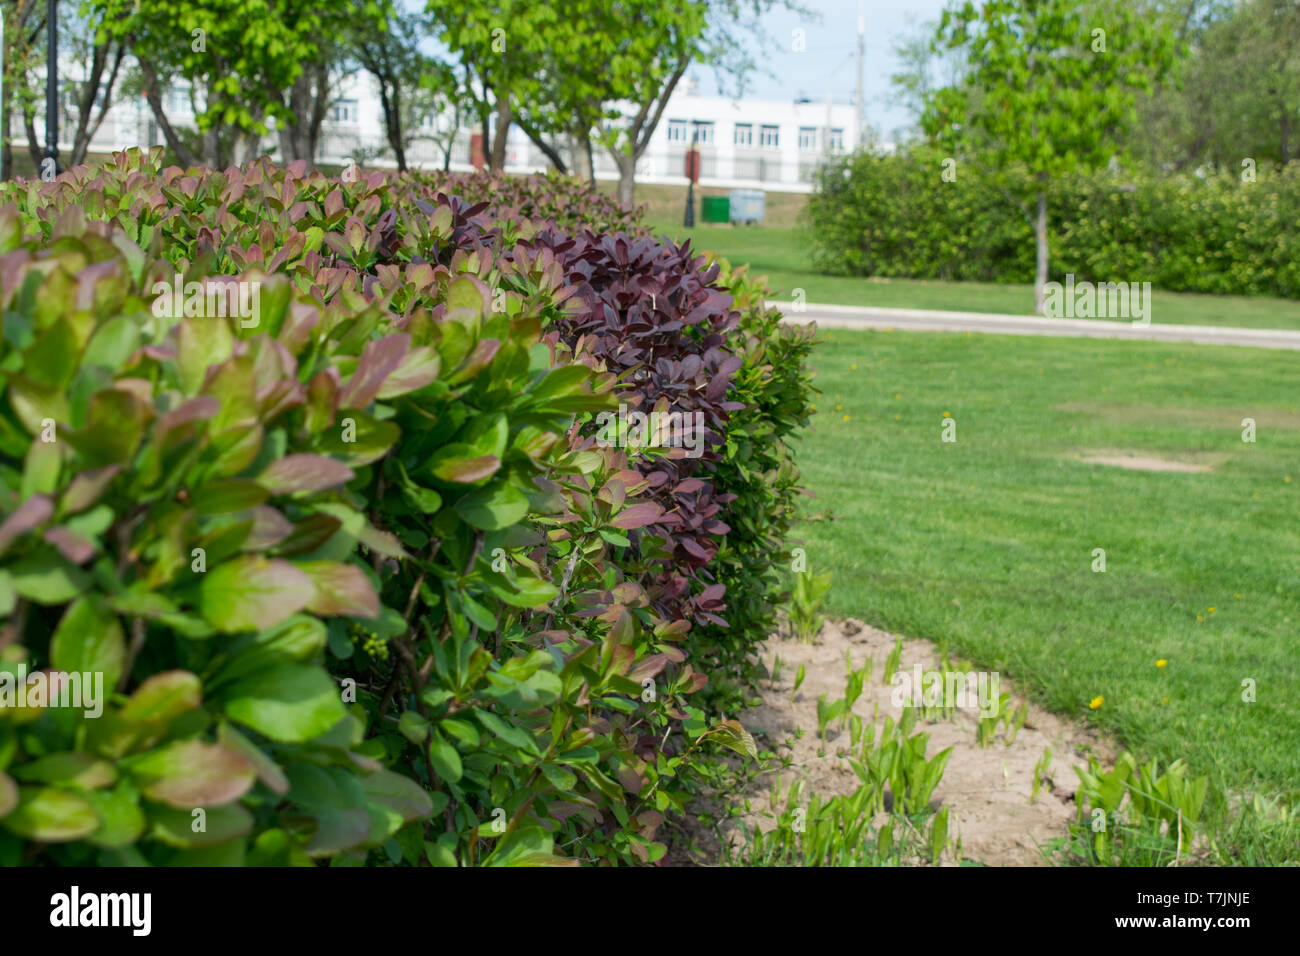 Plants Growing In The Spring Park Flowering Shrubs Flowers Stock